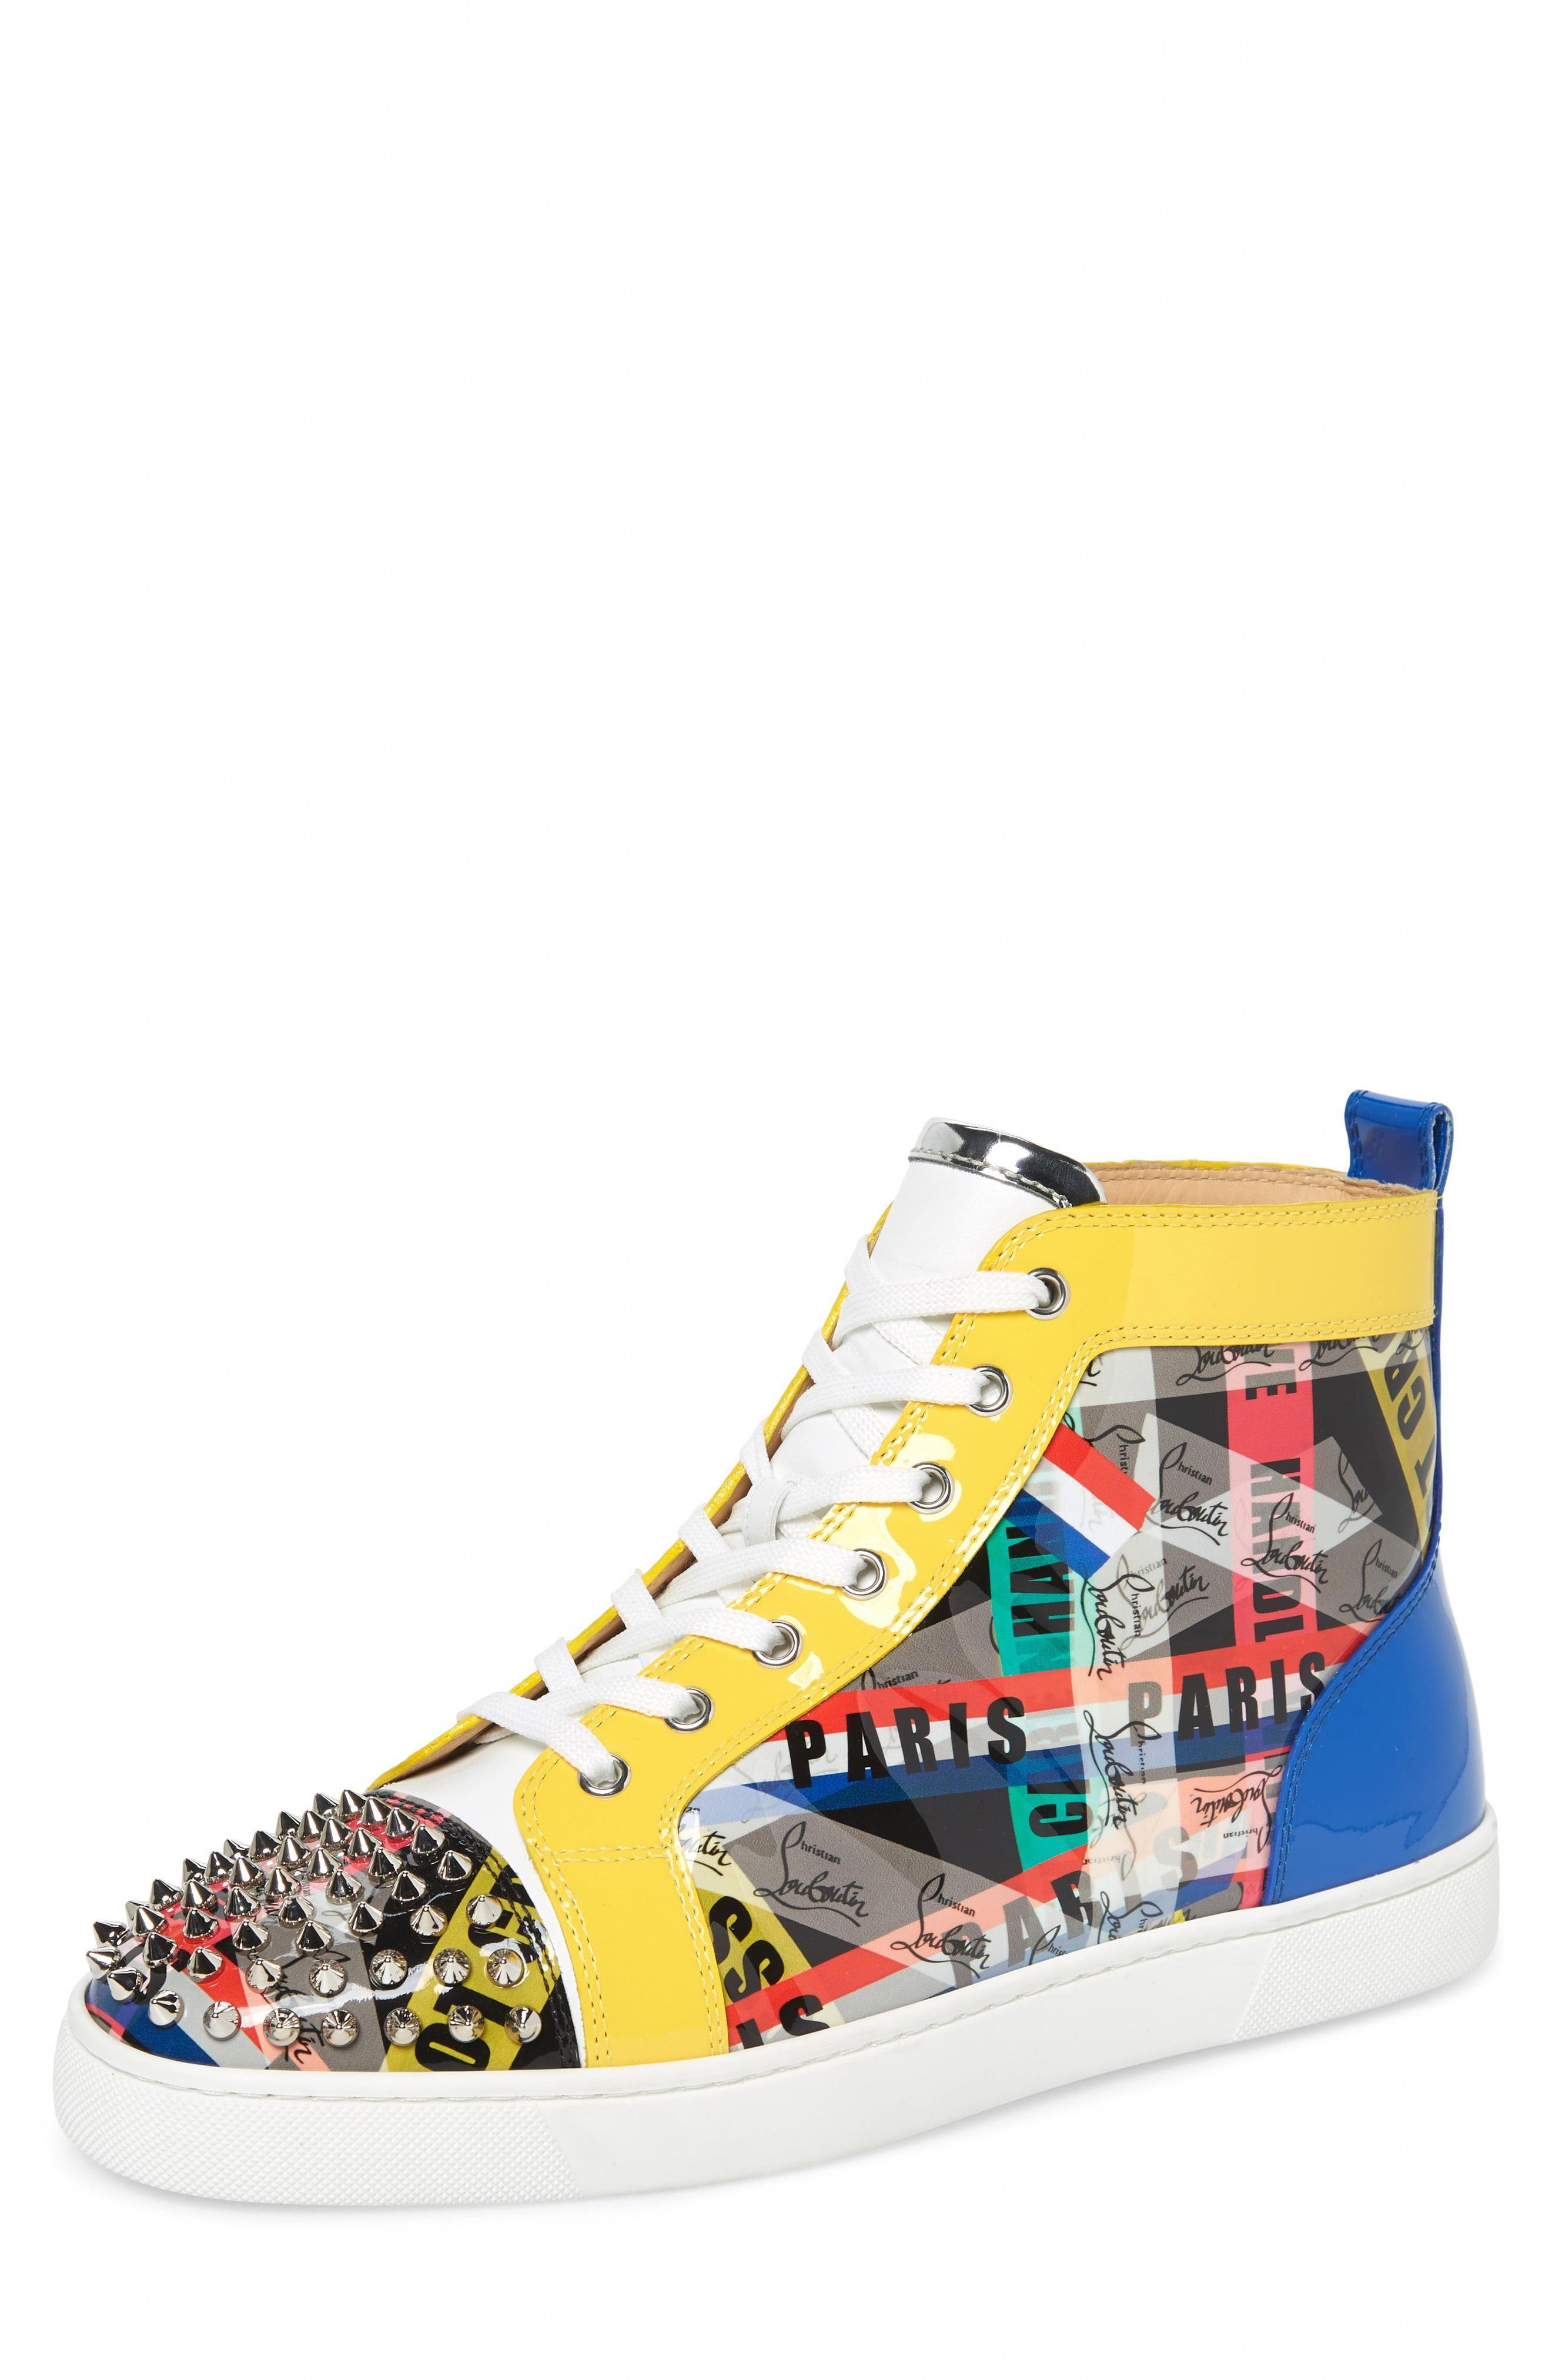 Trendy mens shoes